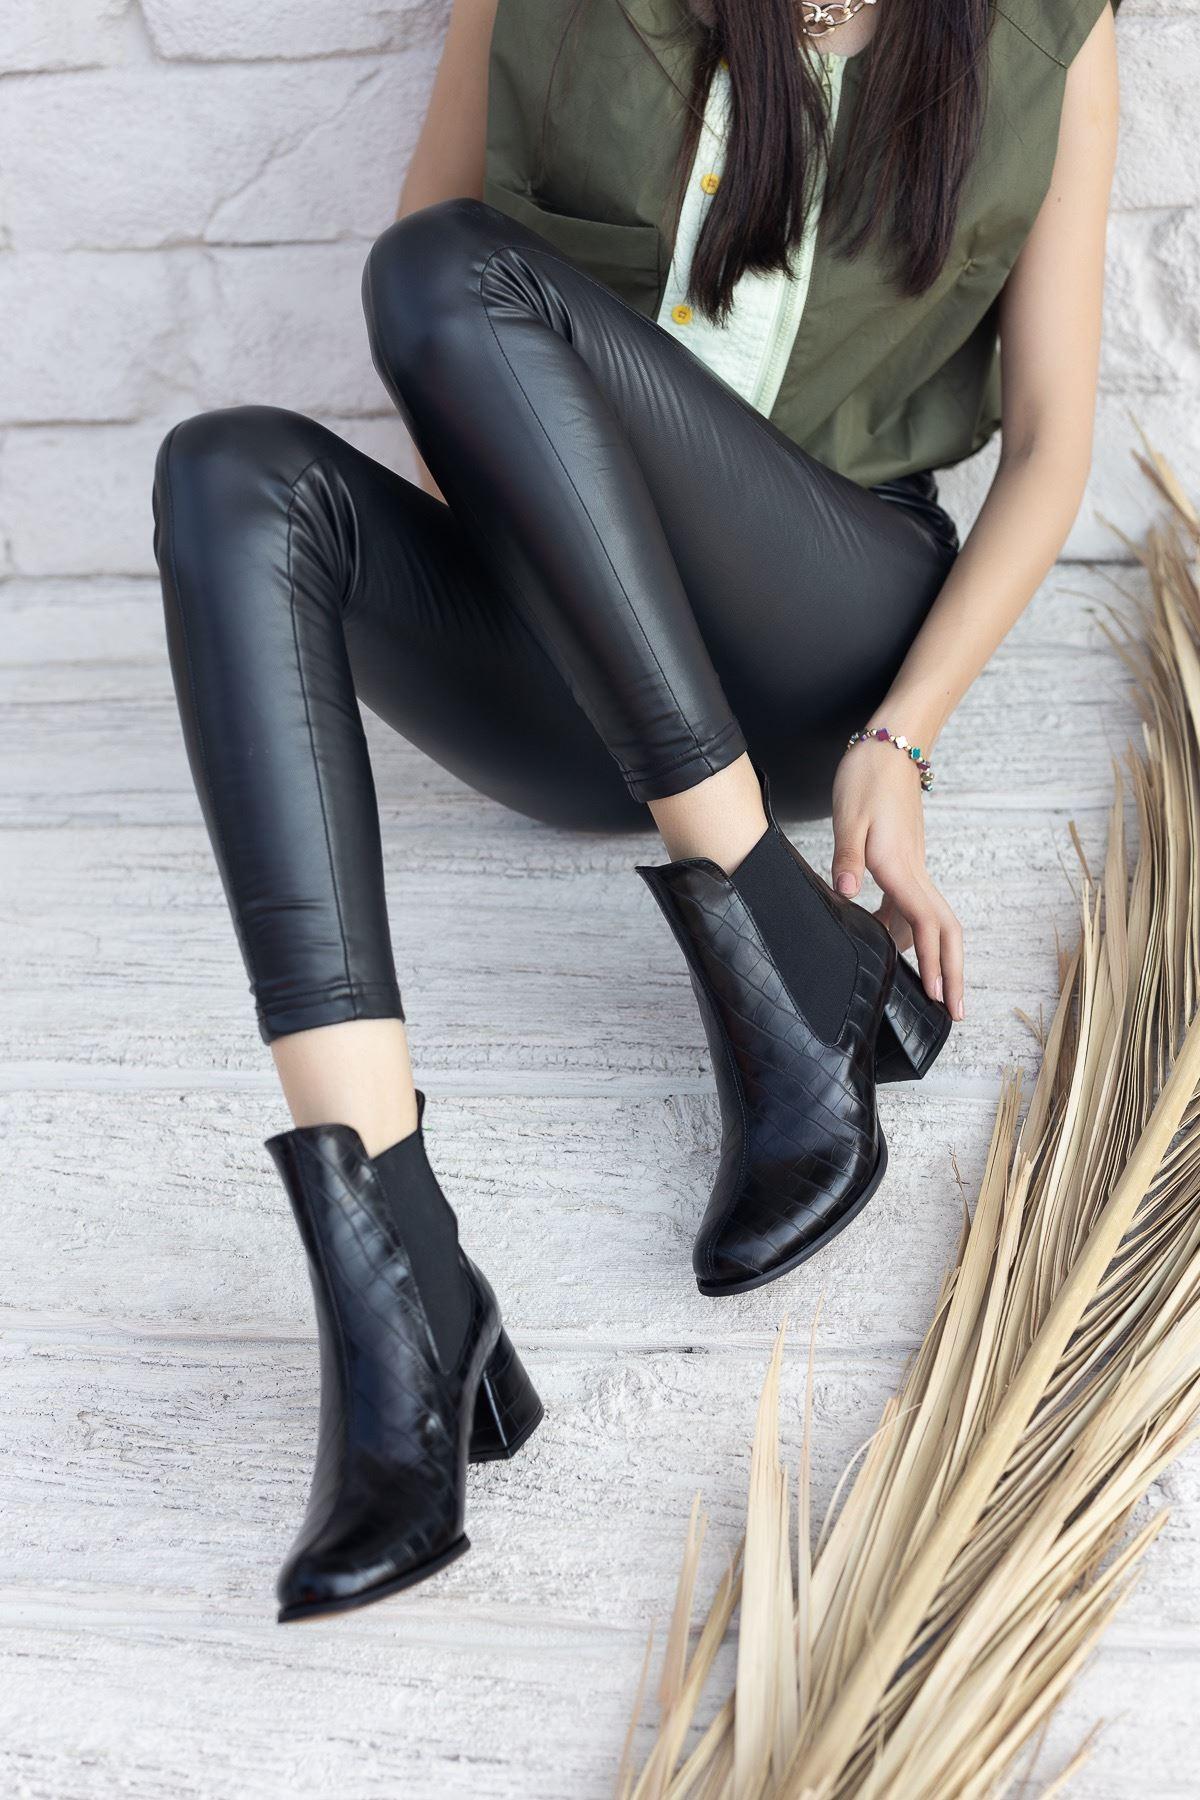 Kadın Dosela Lastikli  Kısa Topuklu Siyah Rugan Bot